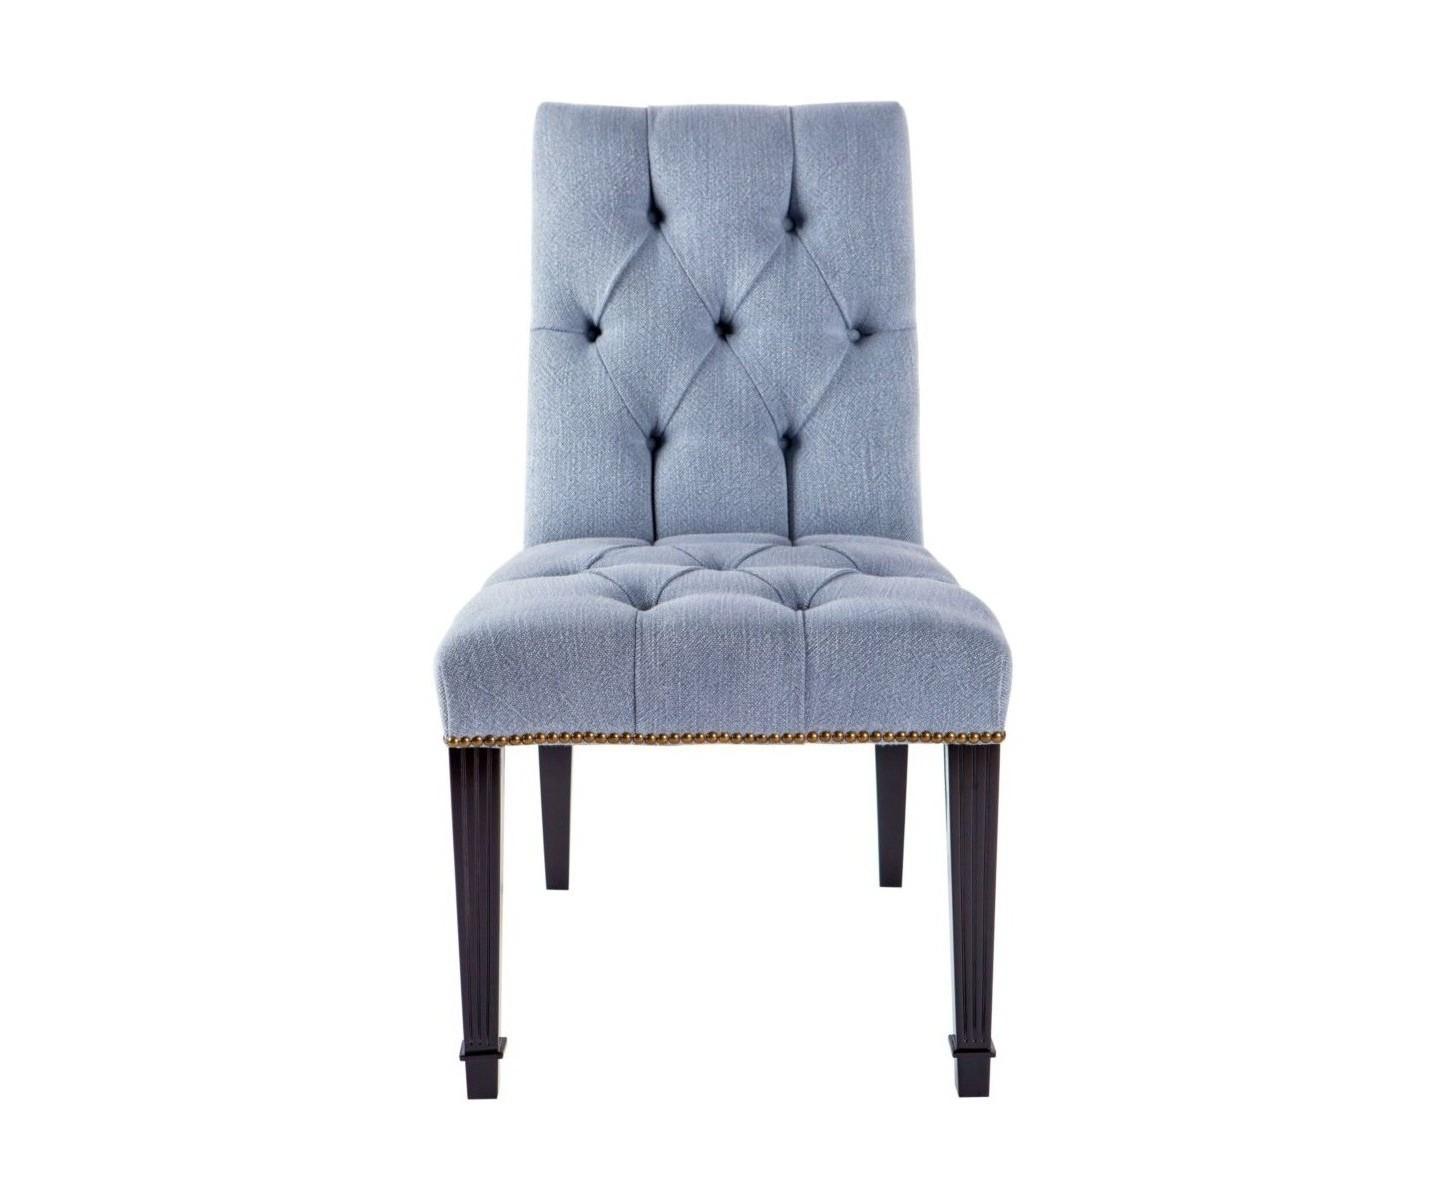 Кухонный стул M-Style 15436657 от thefurnish